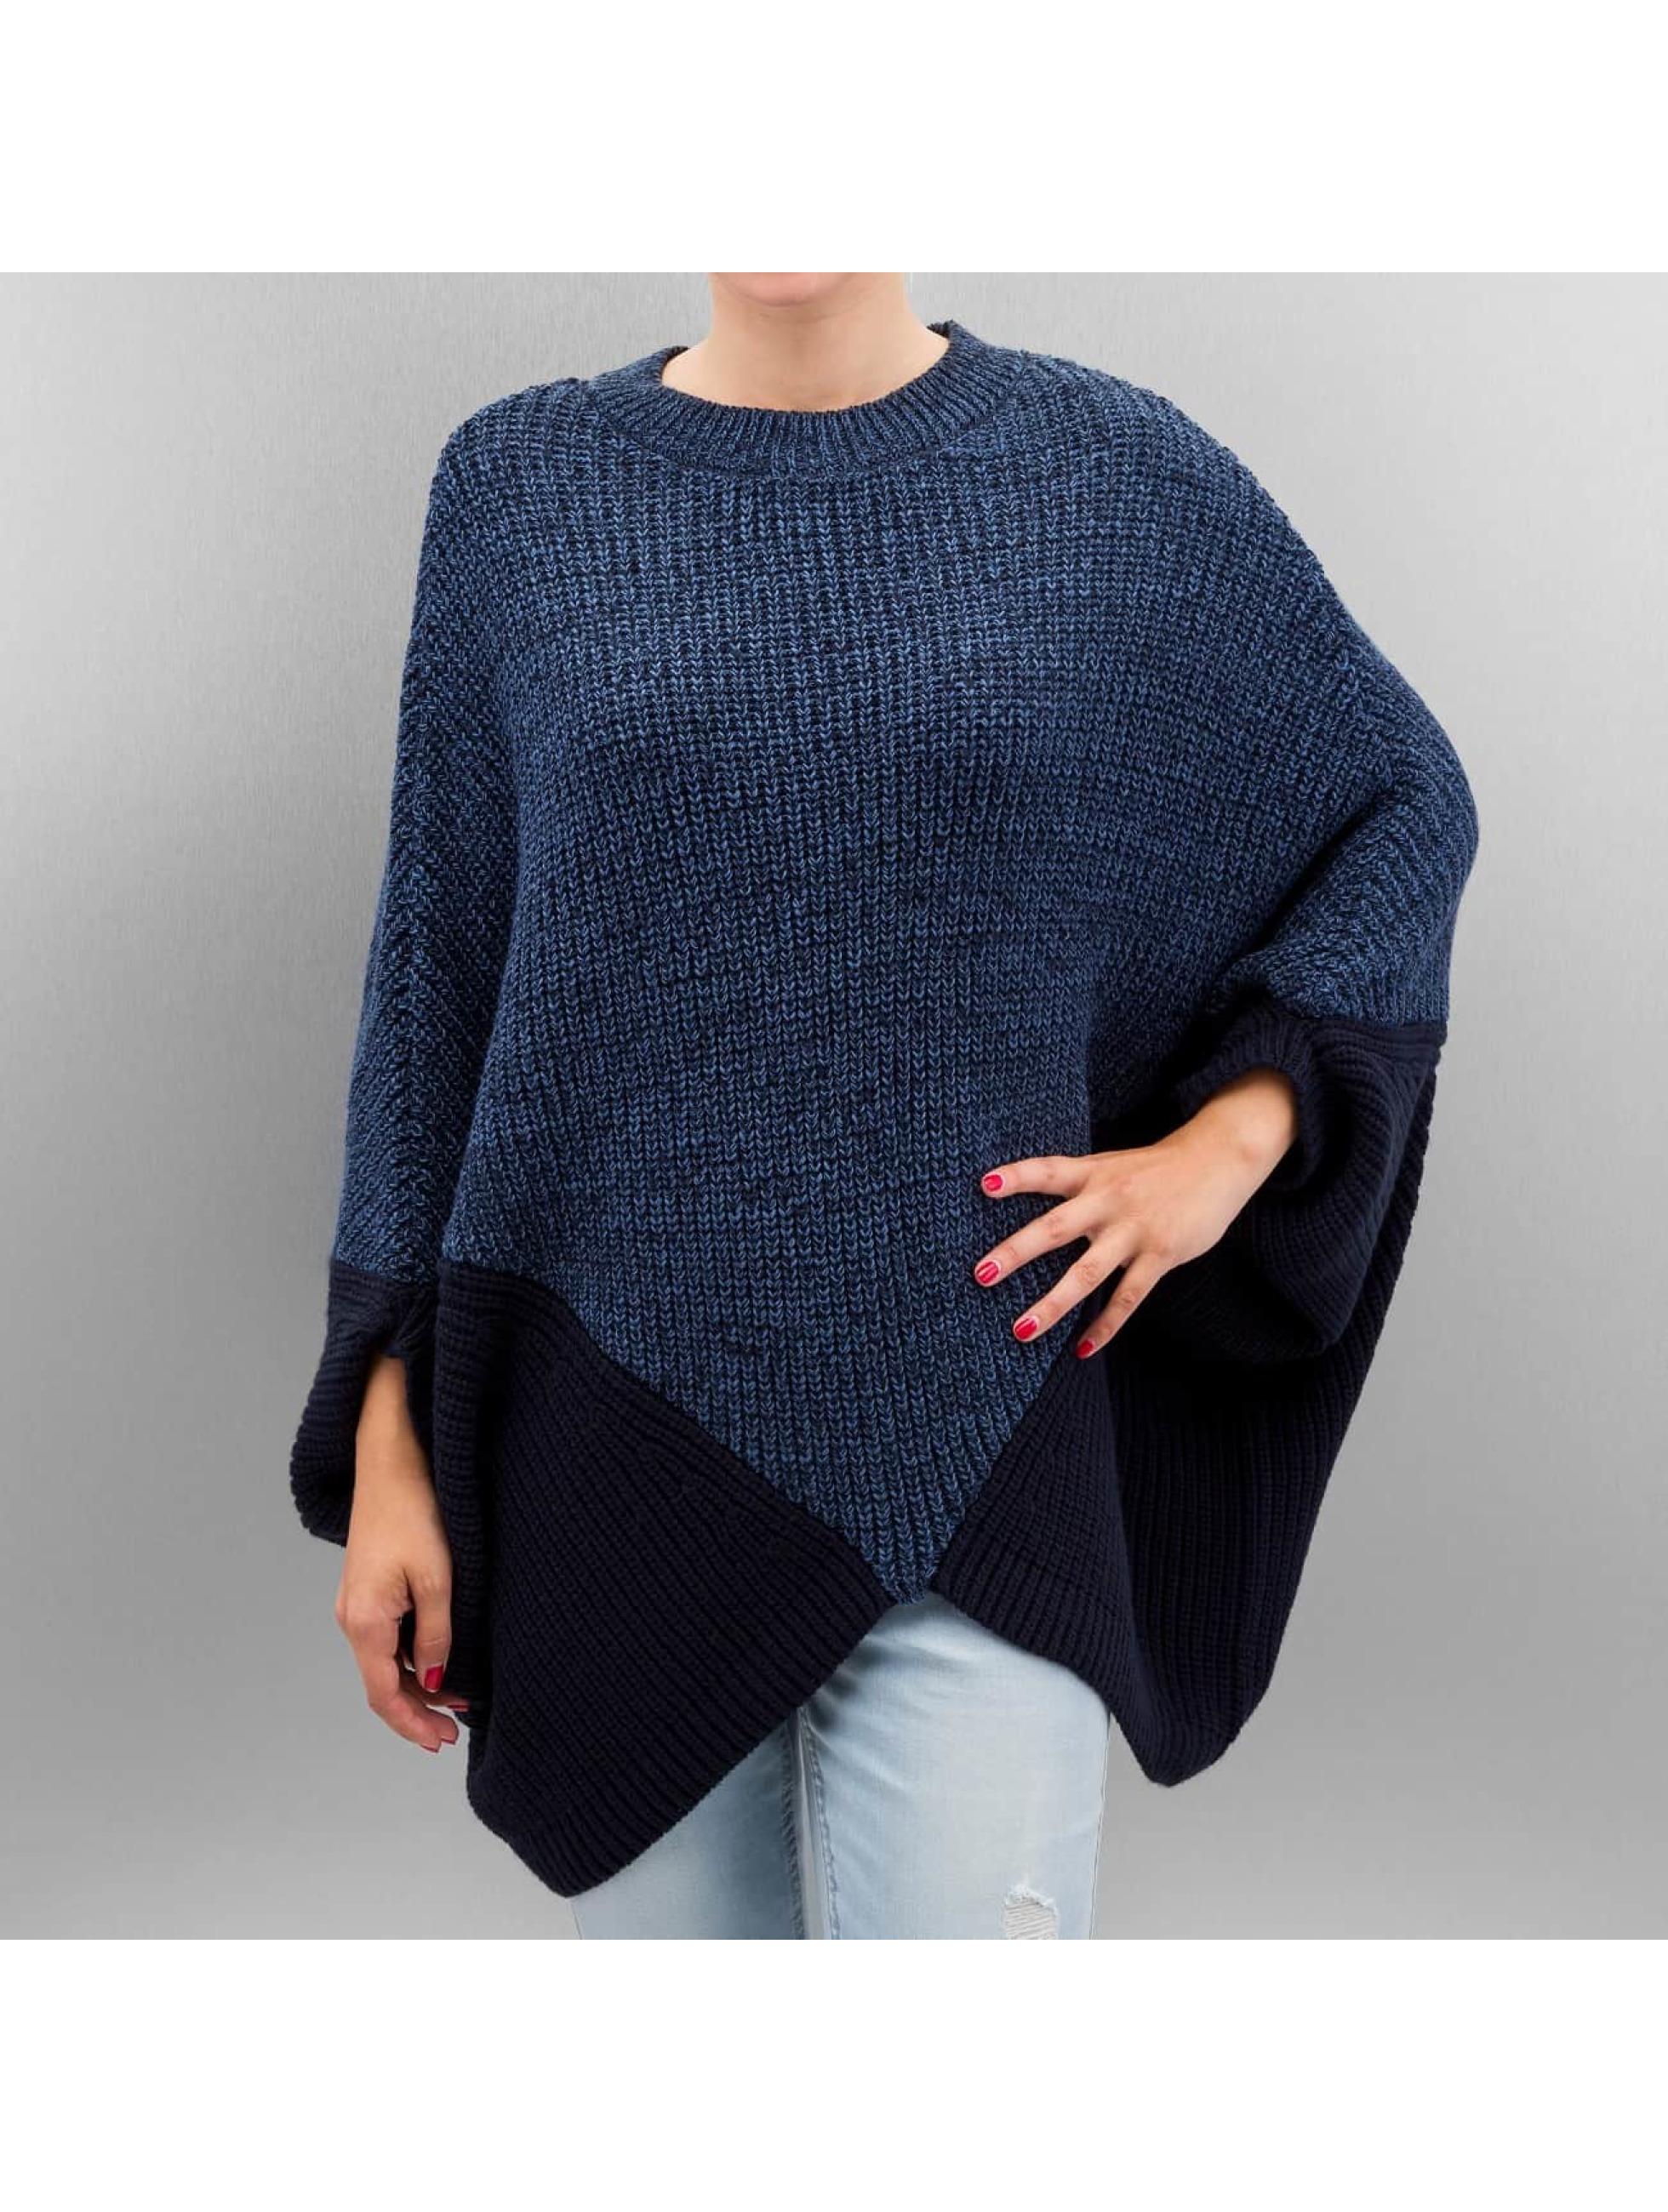 Pullover cmProud Knit in blau